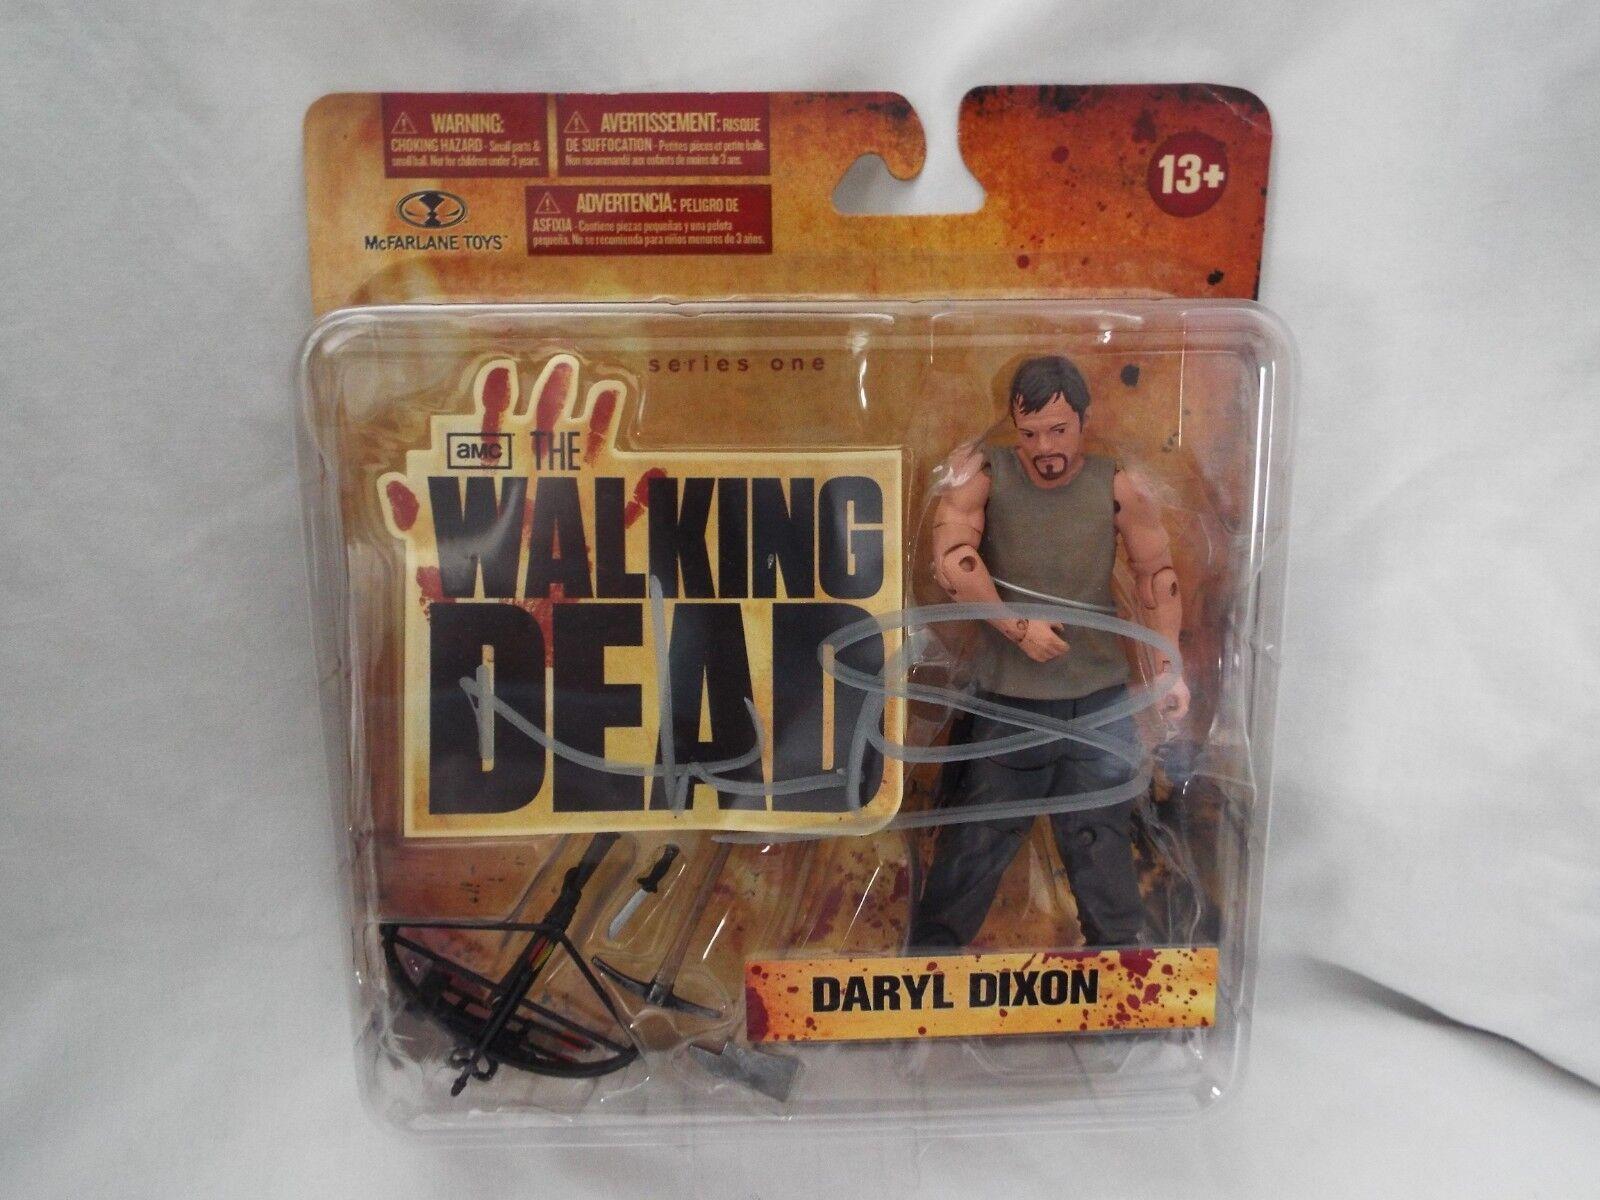 Autografiado Walking Dead Daryl Dixon TV Show Serie 1 figura 2011